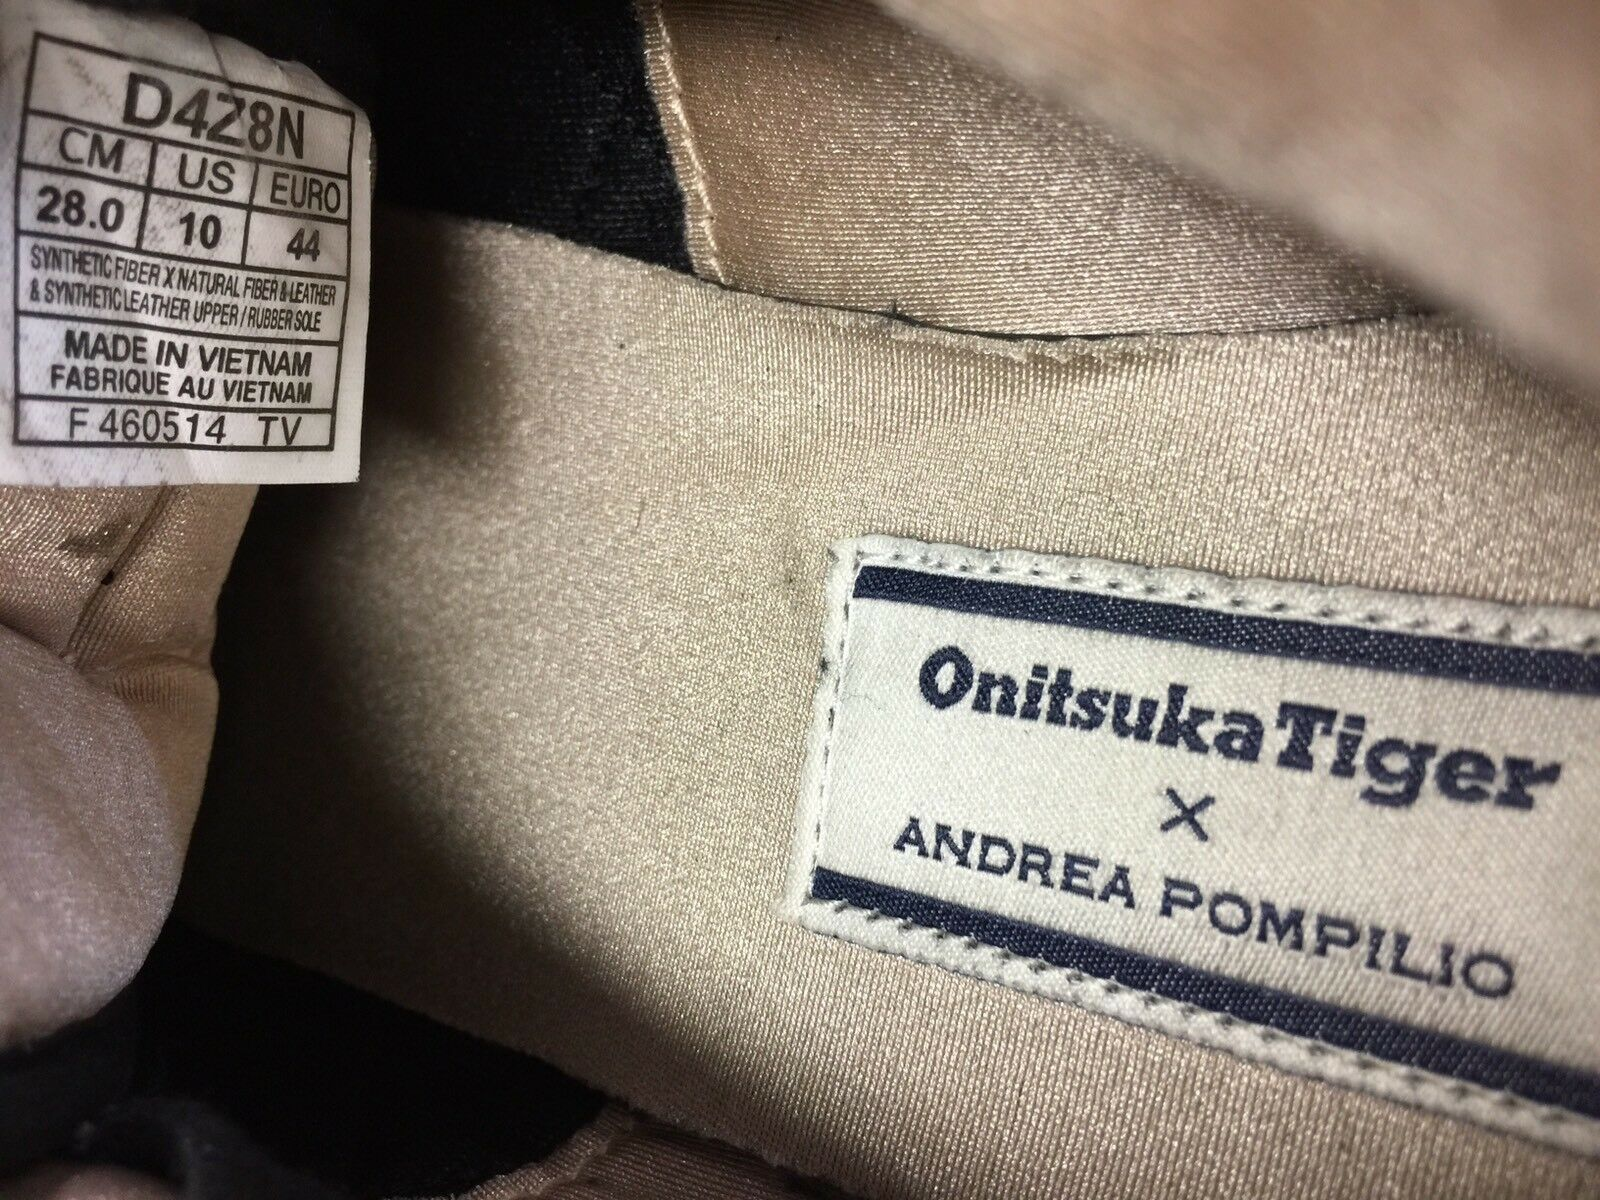 RARE   Asics Onitsuka Tiger Pompilio Colorado '85 X Andrea Pompilio Tiger Sz 10 LE Retro Shoes 57a368